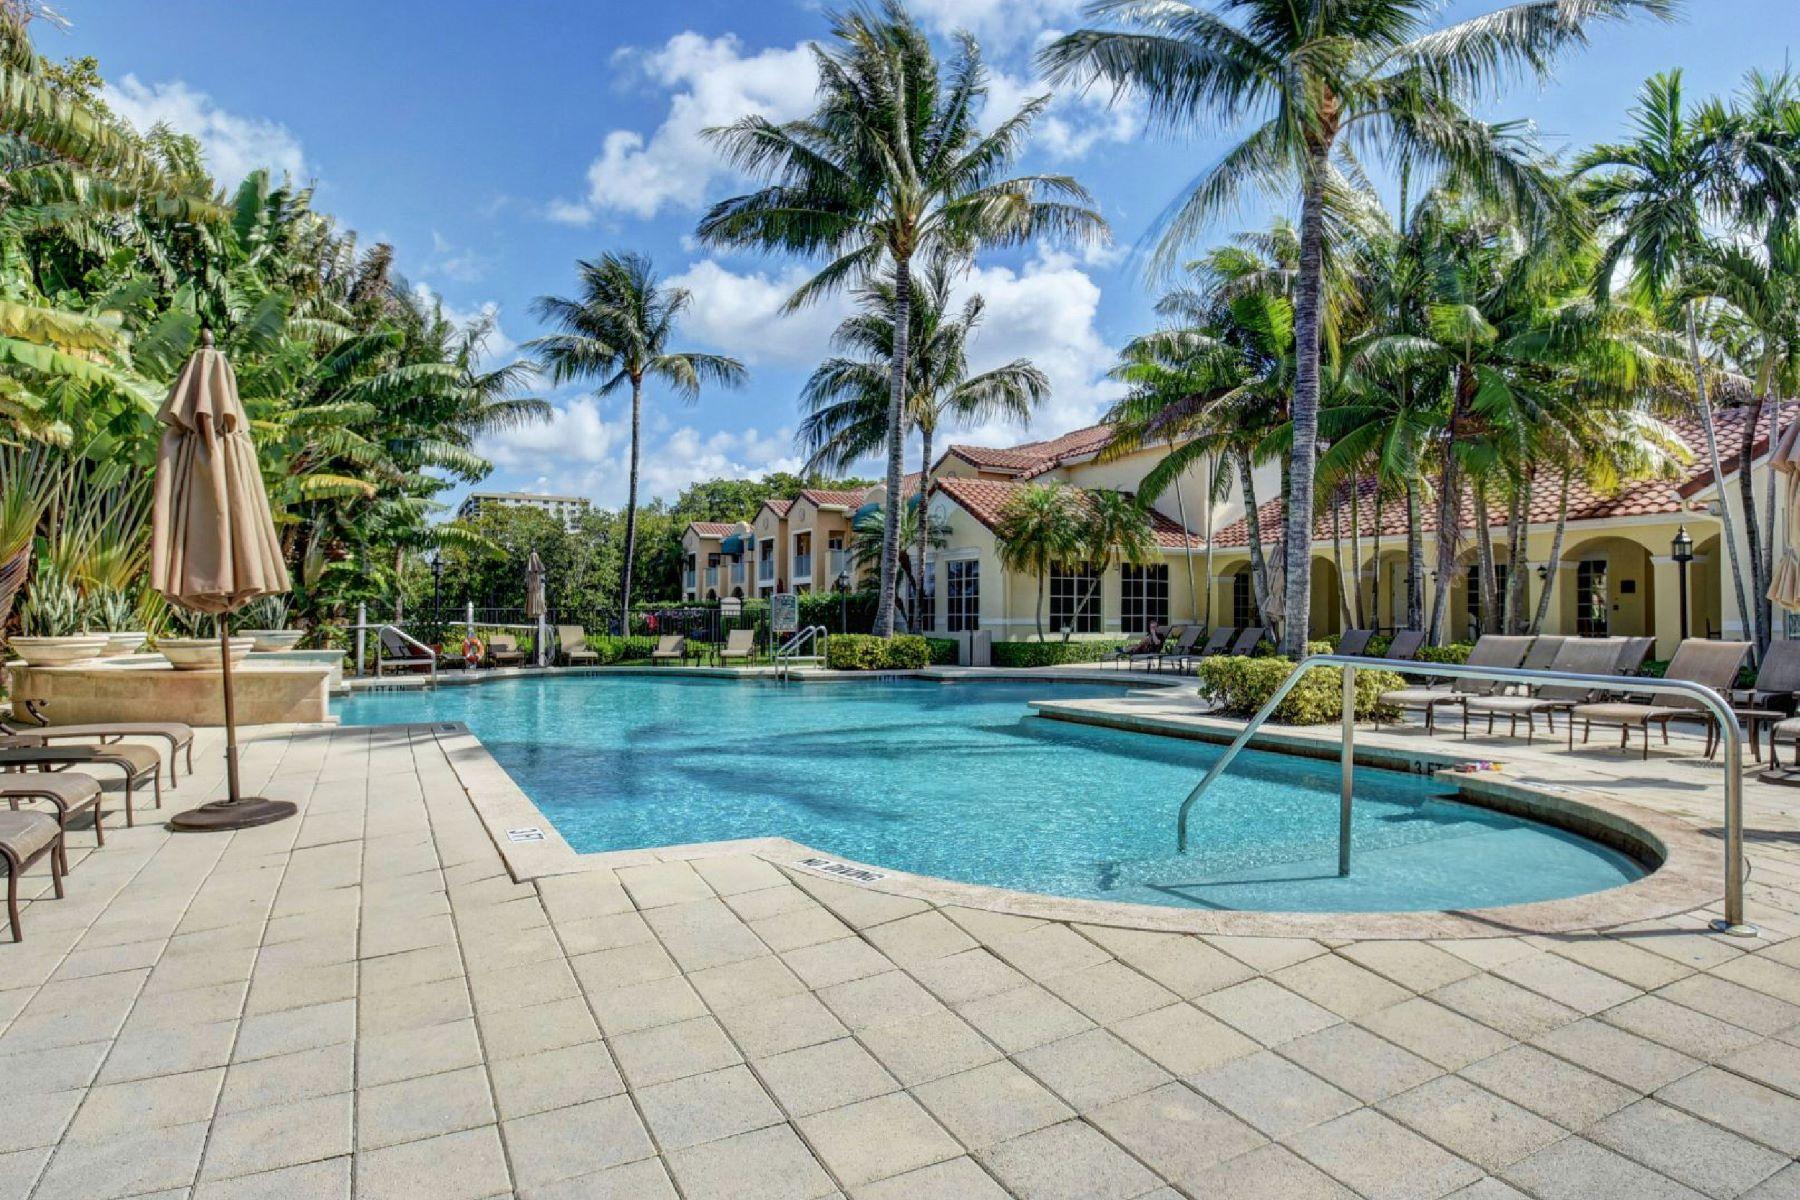 Condominiums 为 销售 在 3606 S Ocean Boulevard 107 高地海滩, 佛罗里达州 33487 美国